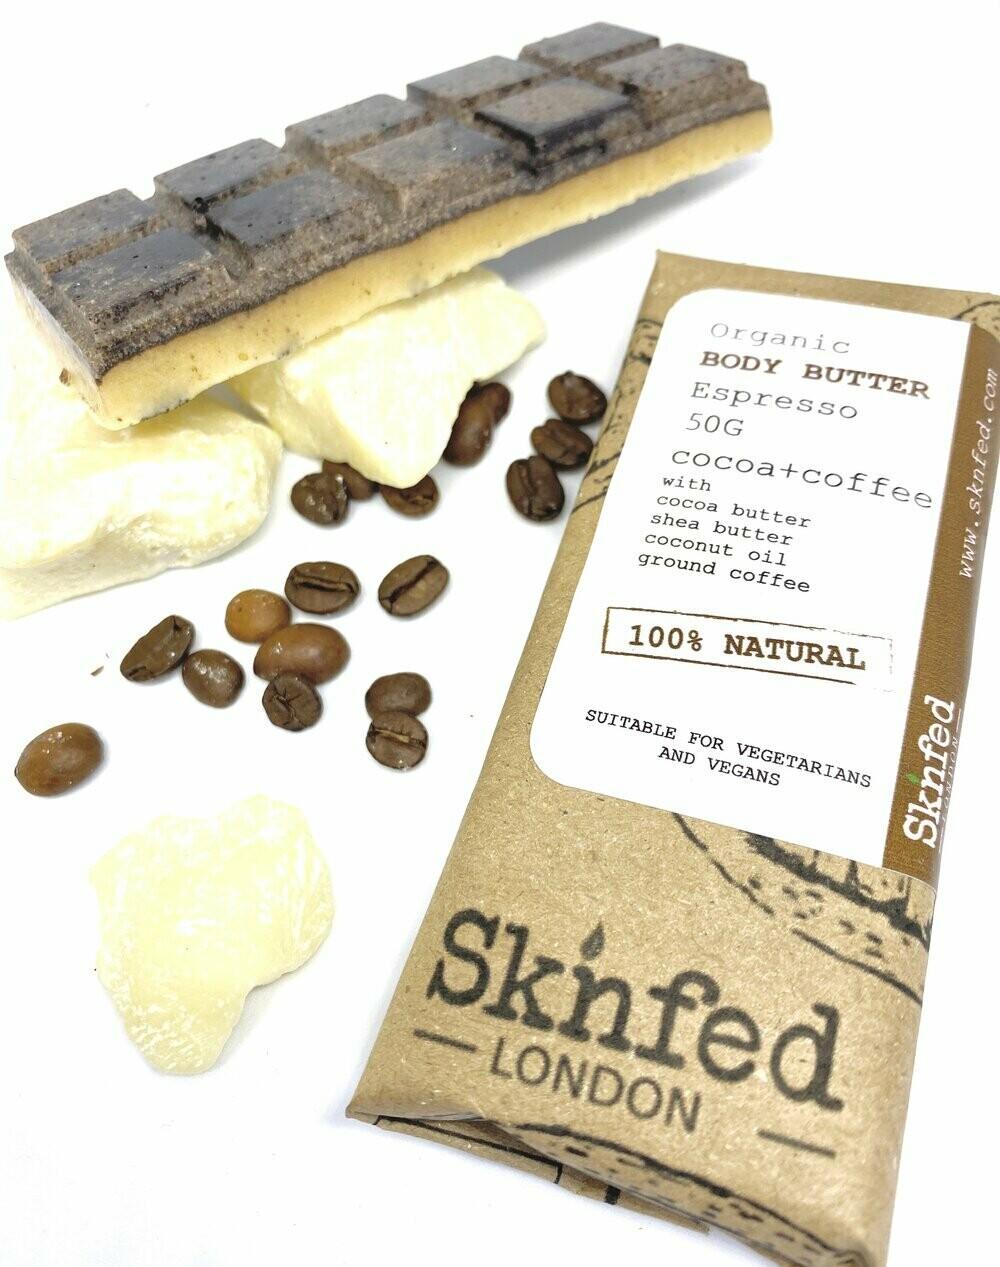 Sknfed Organic Body Butter-Espresso, 50g